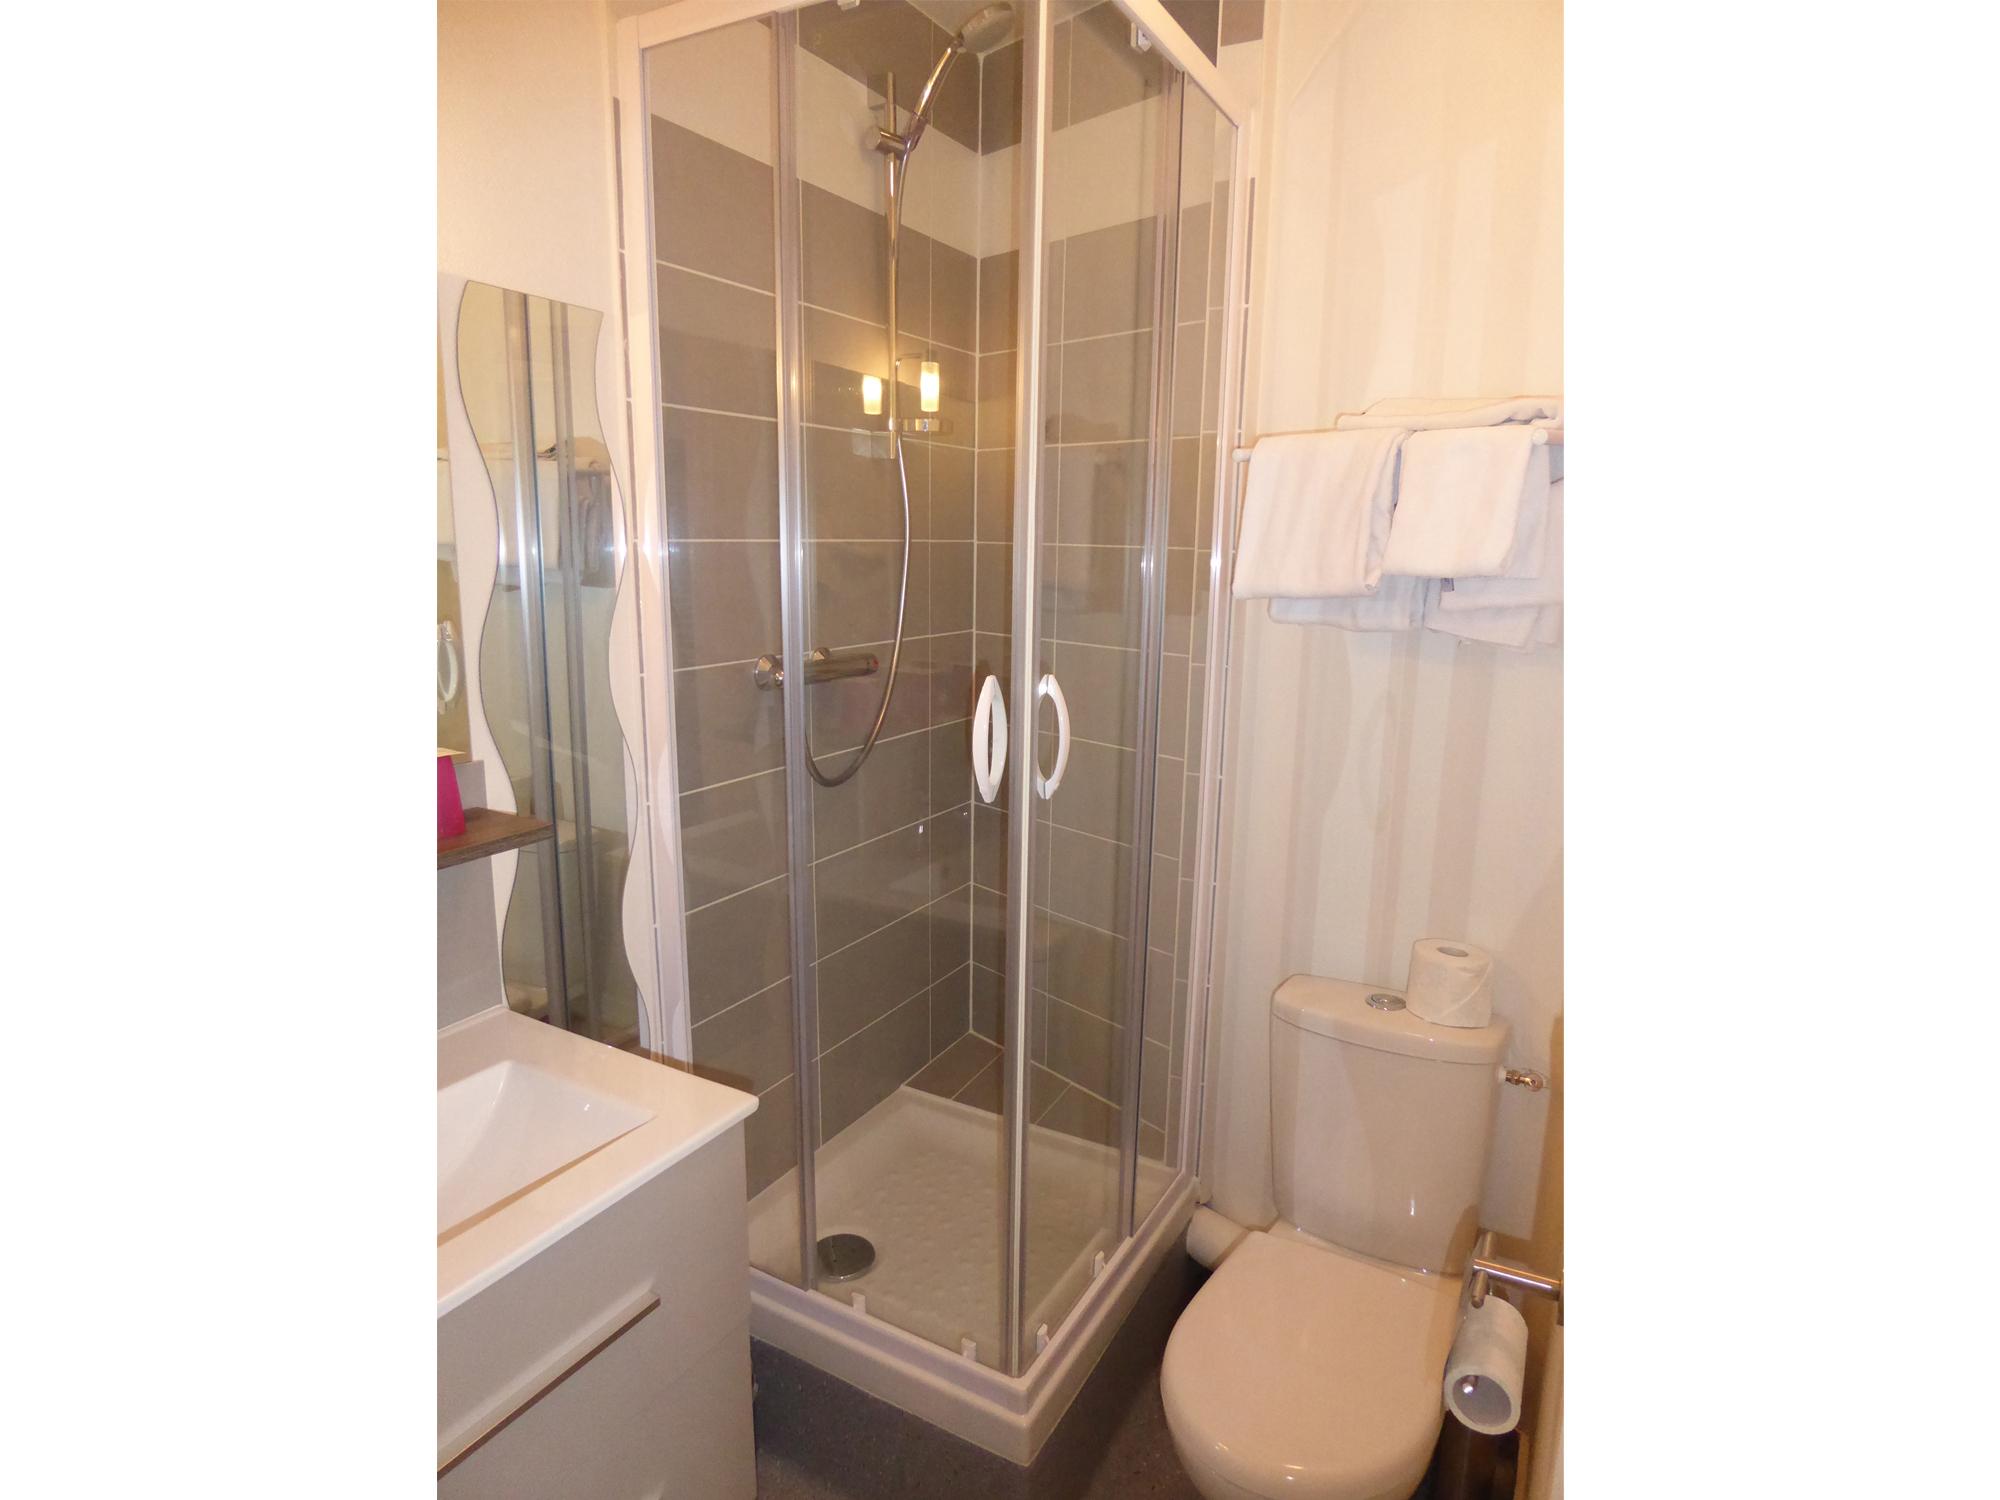 sallede-bain-chambre-familiale-hotel-rennes.jpg